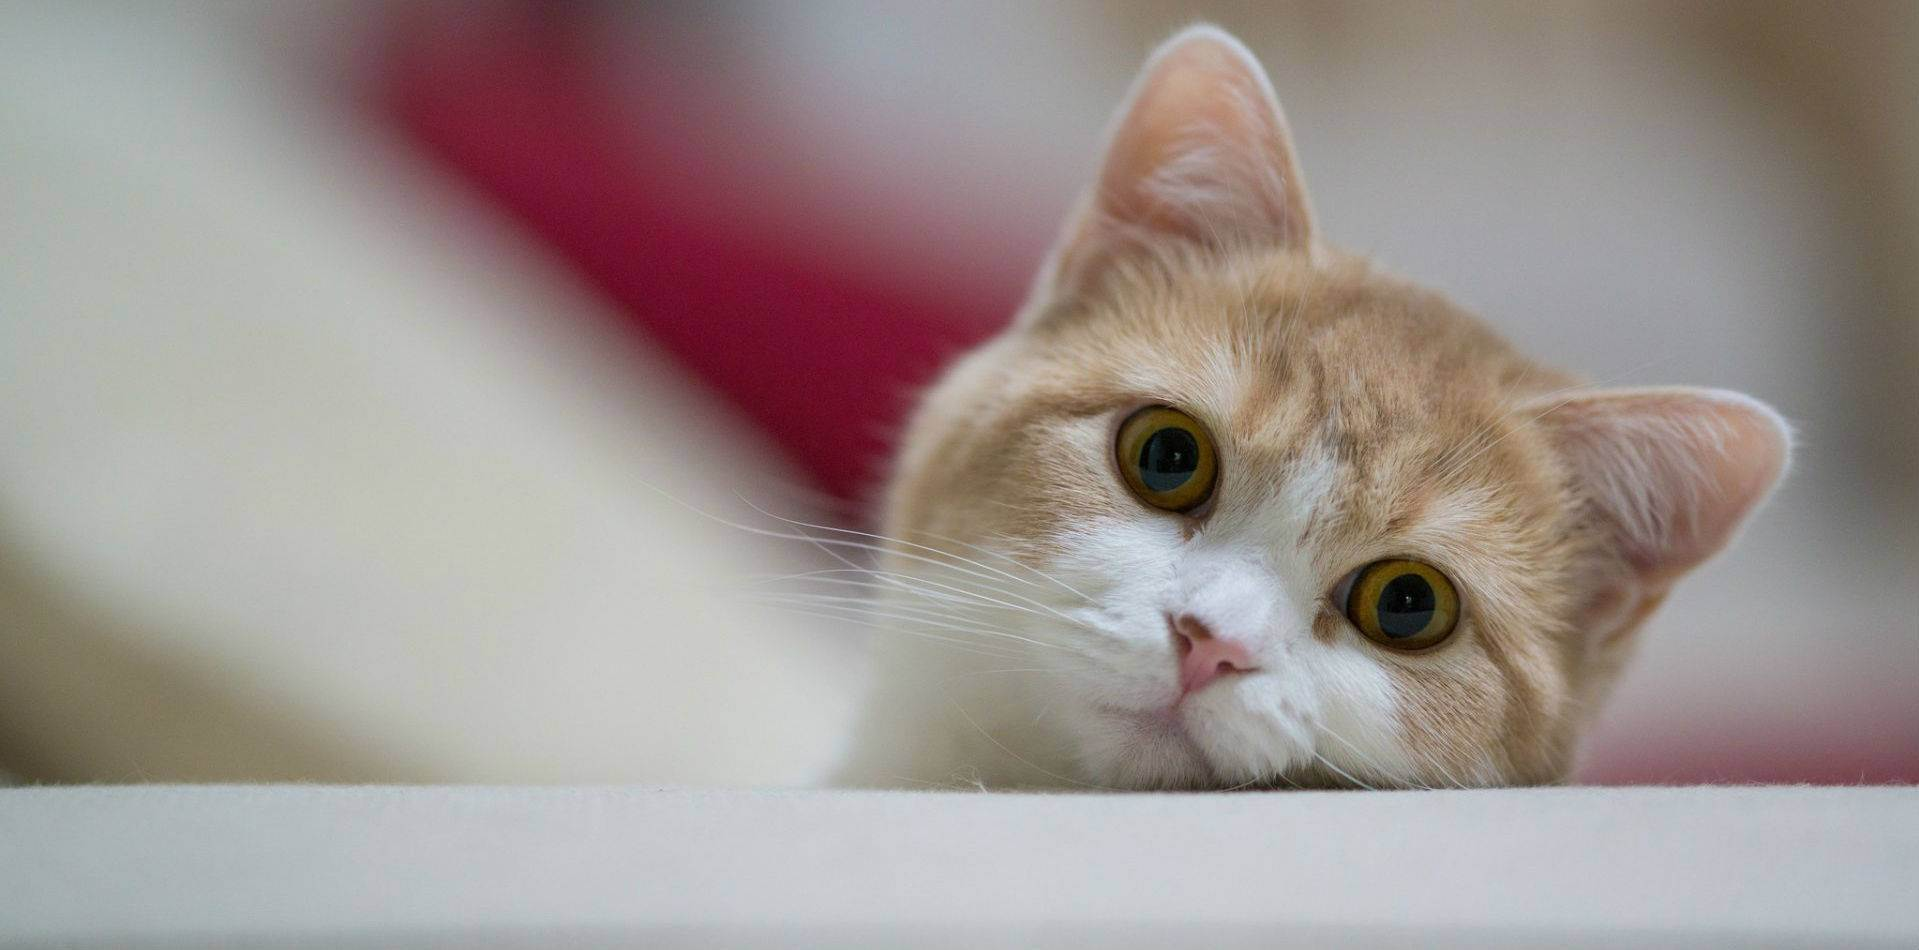 Преимущества и недостатки стерилизации кошки